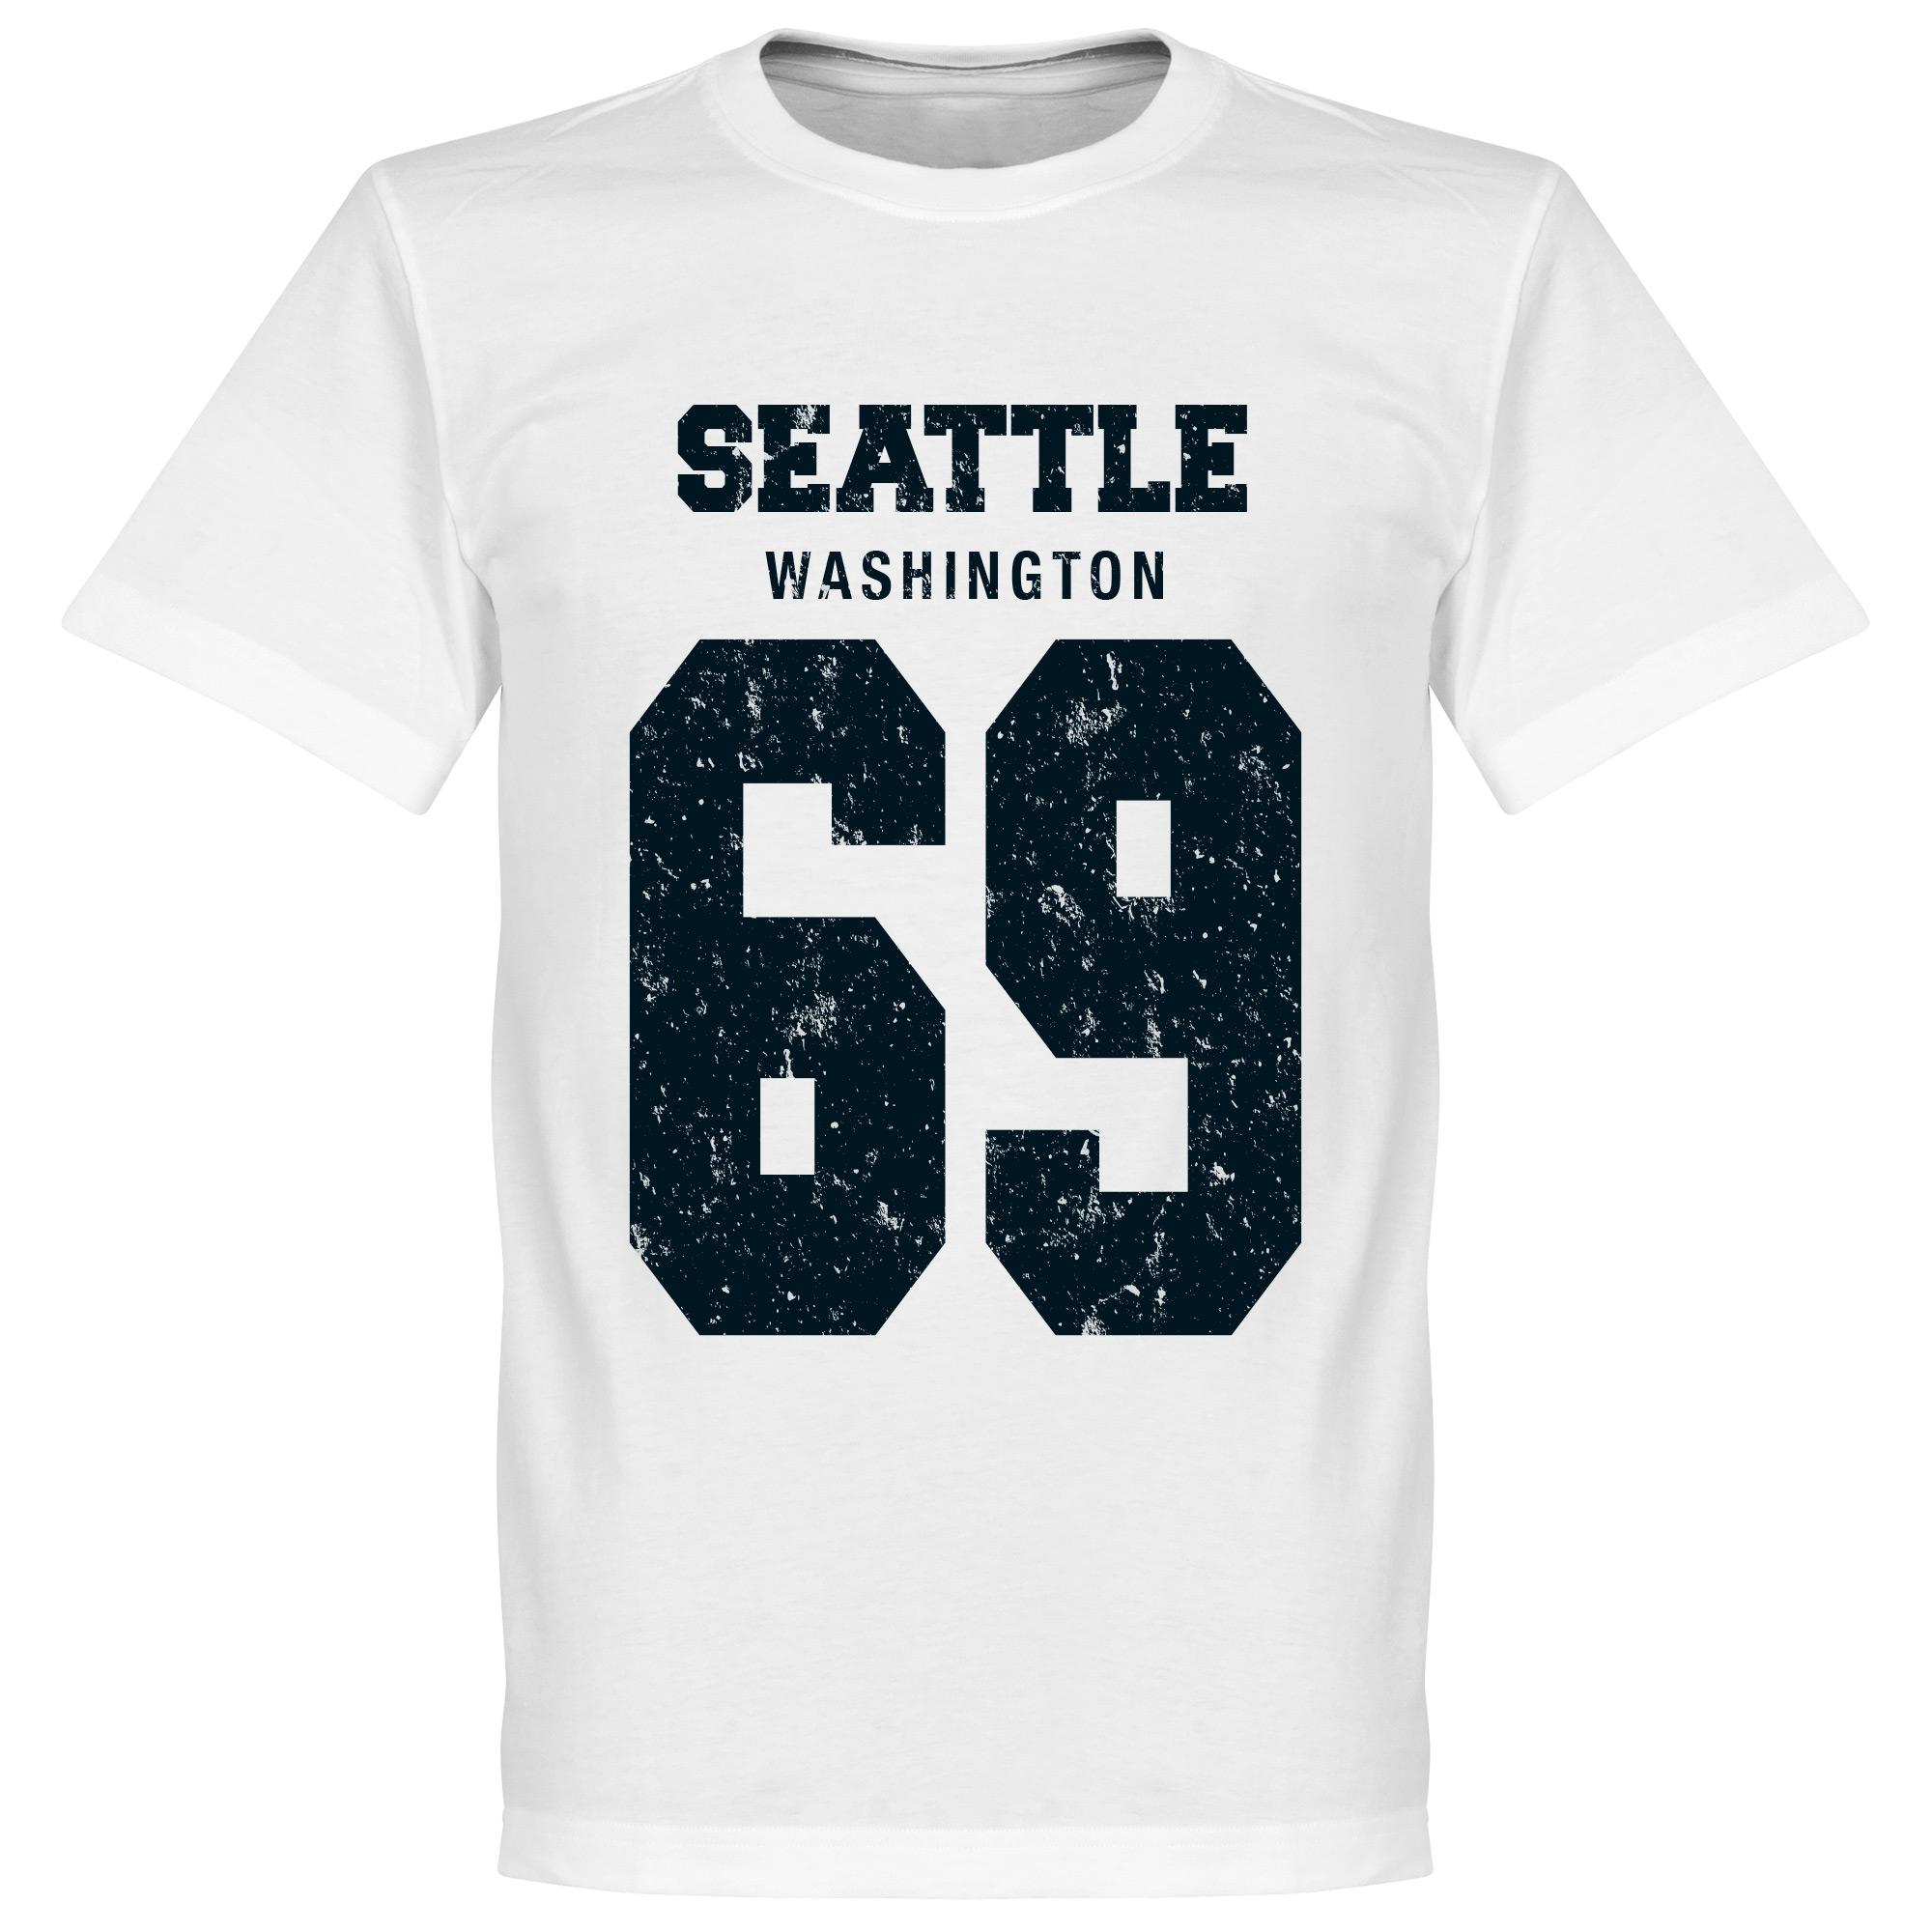 Seattle '69 T-Shirt